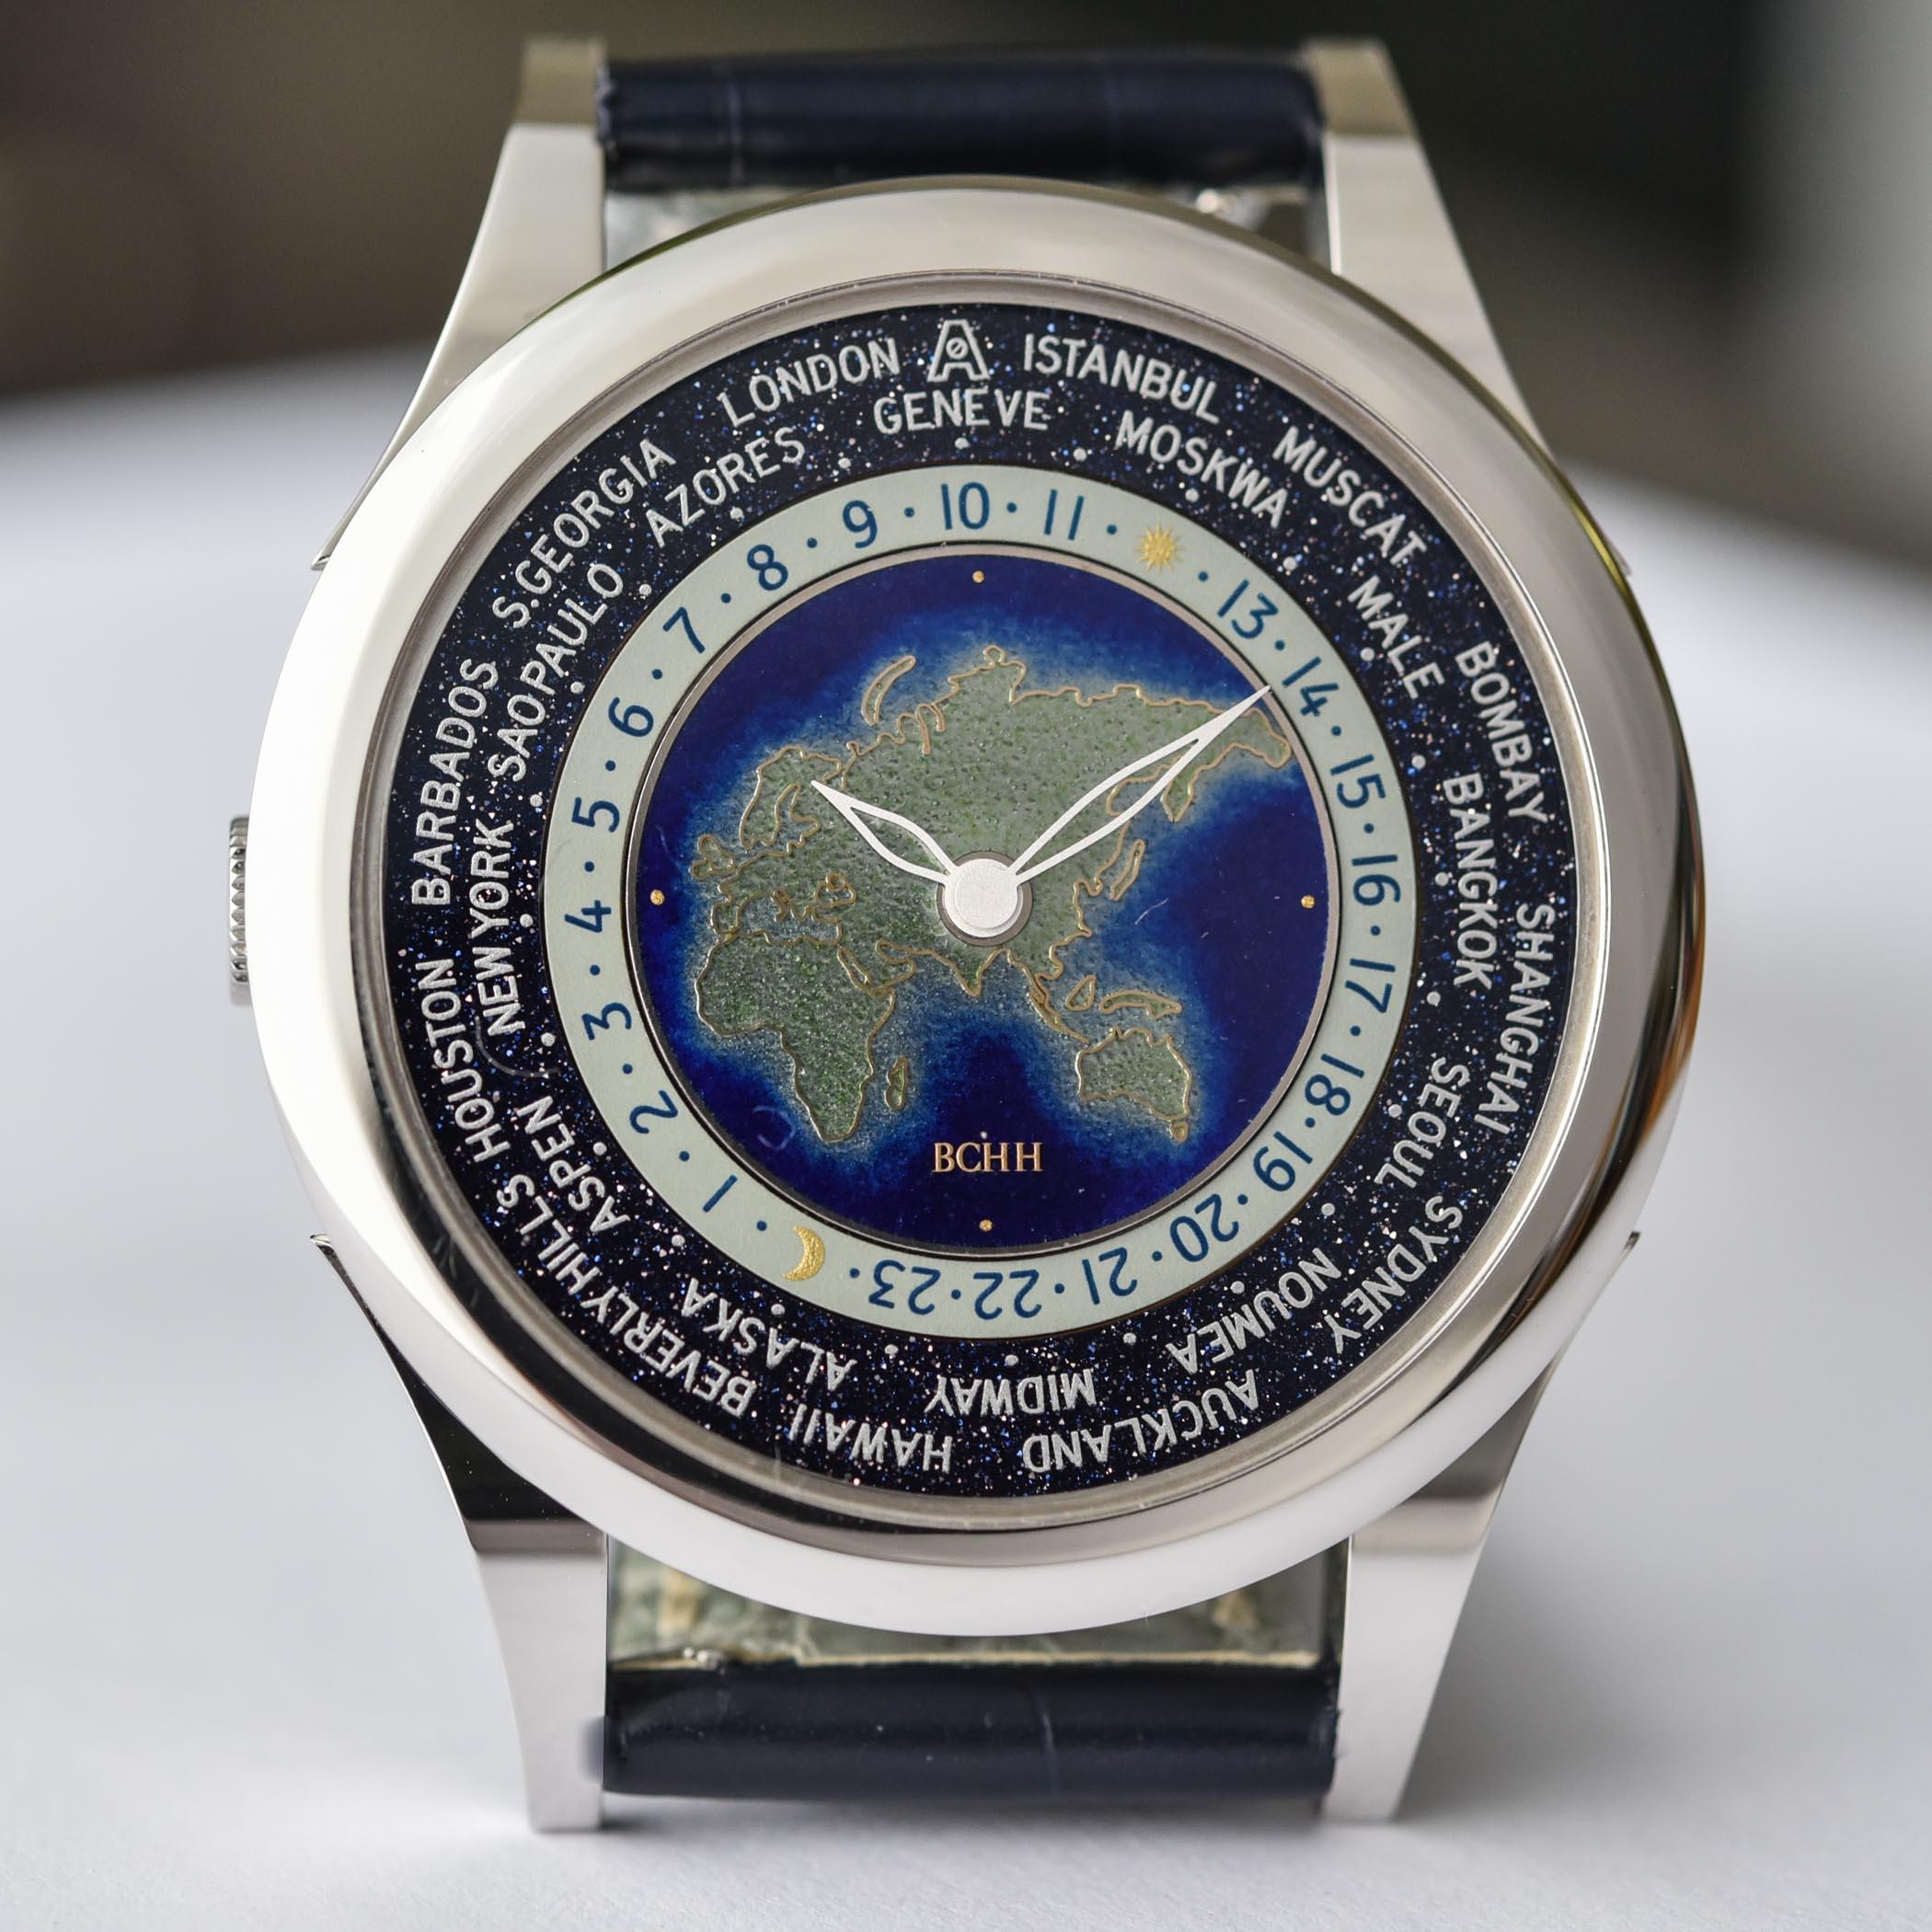 BCHH Celestial Voyager World Timer Cloisonne Enamel Andersen Geneve - 1